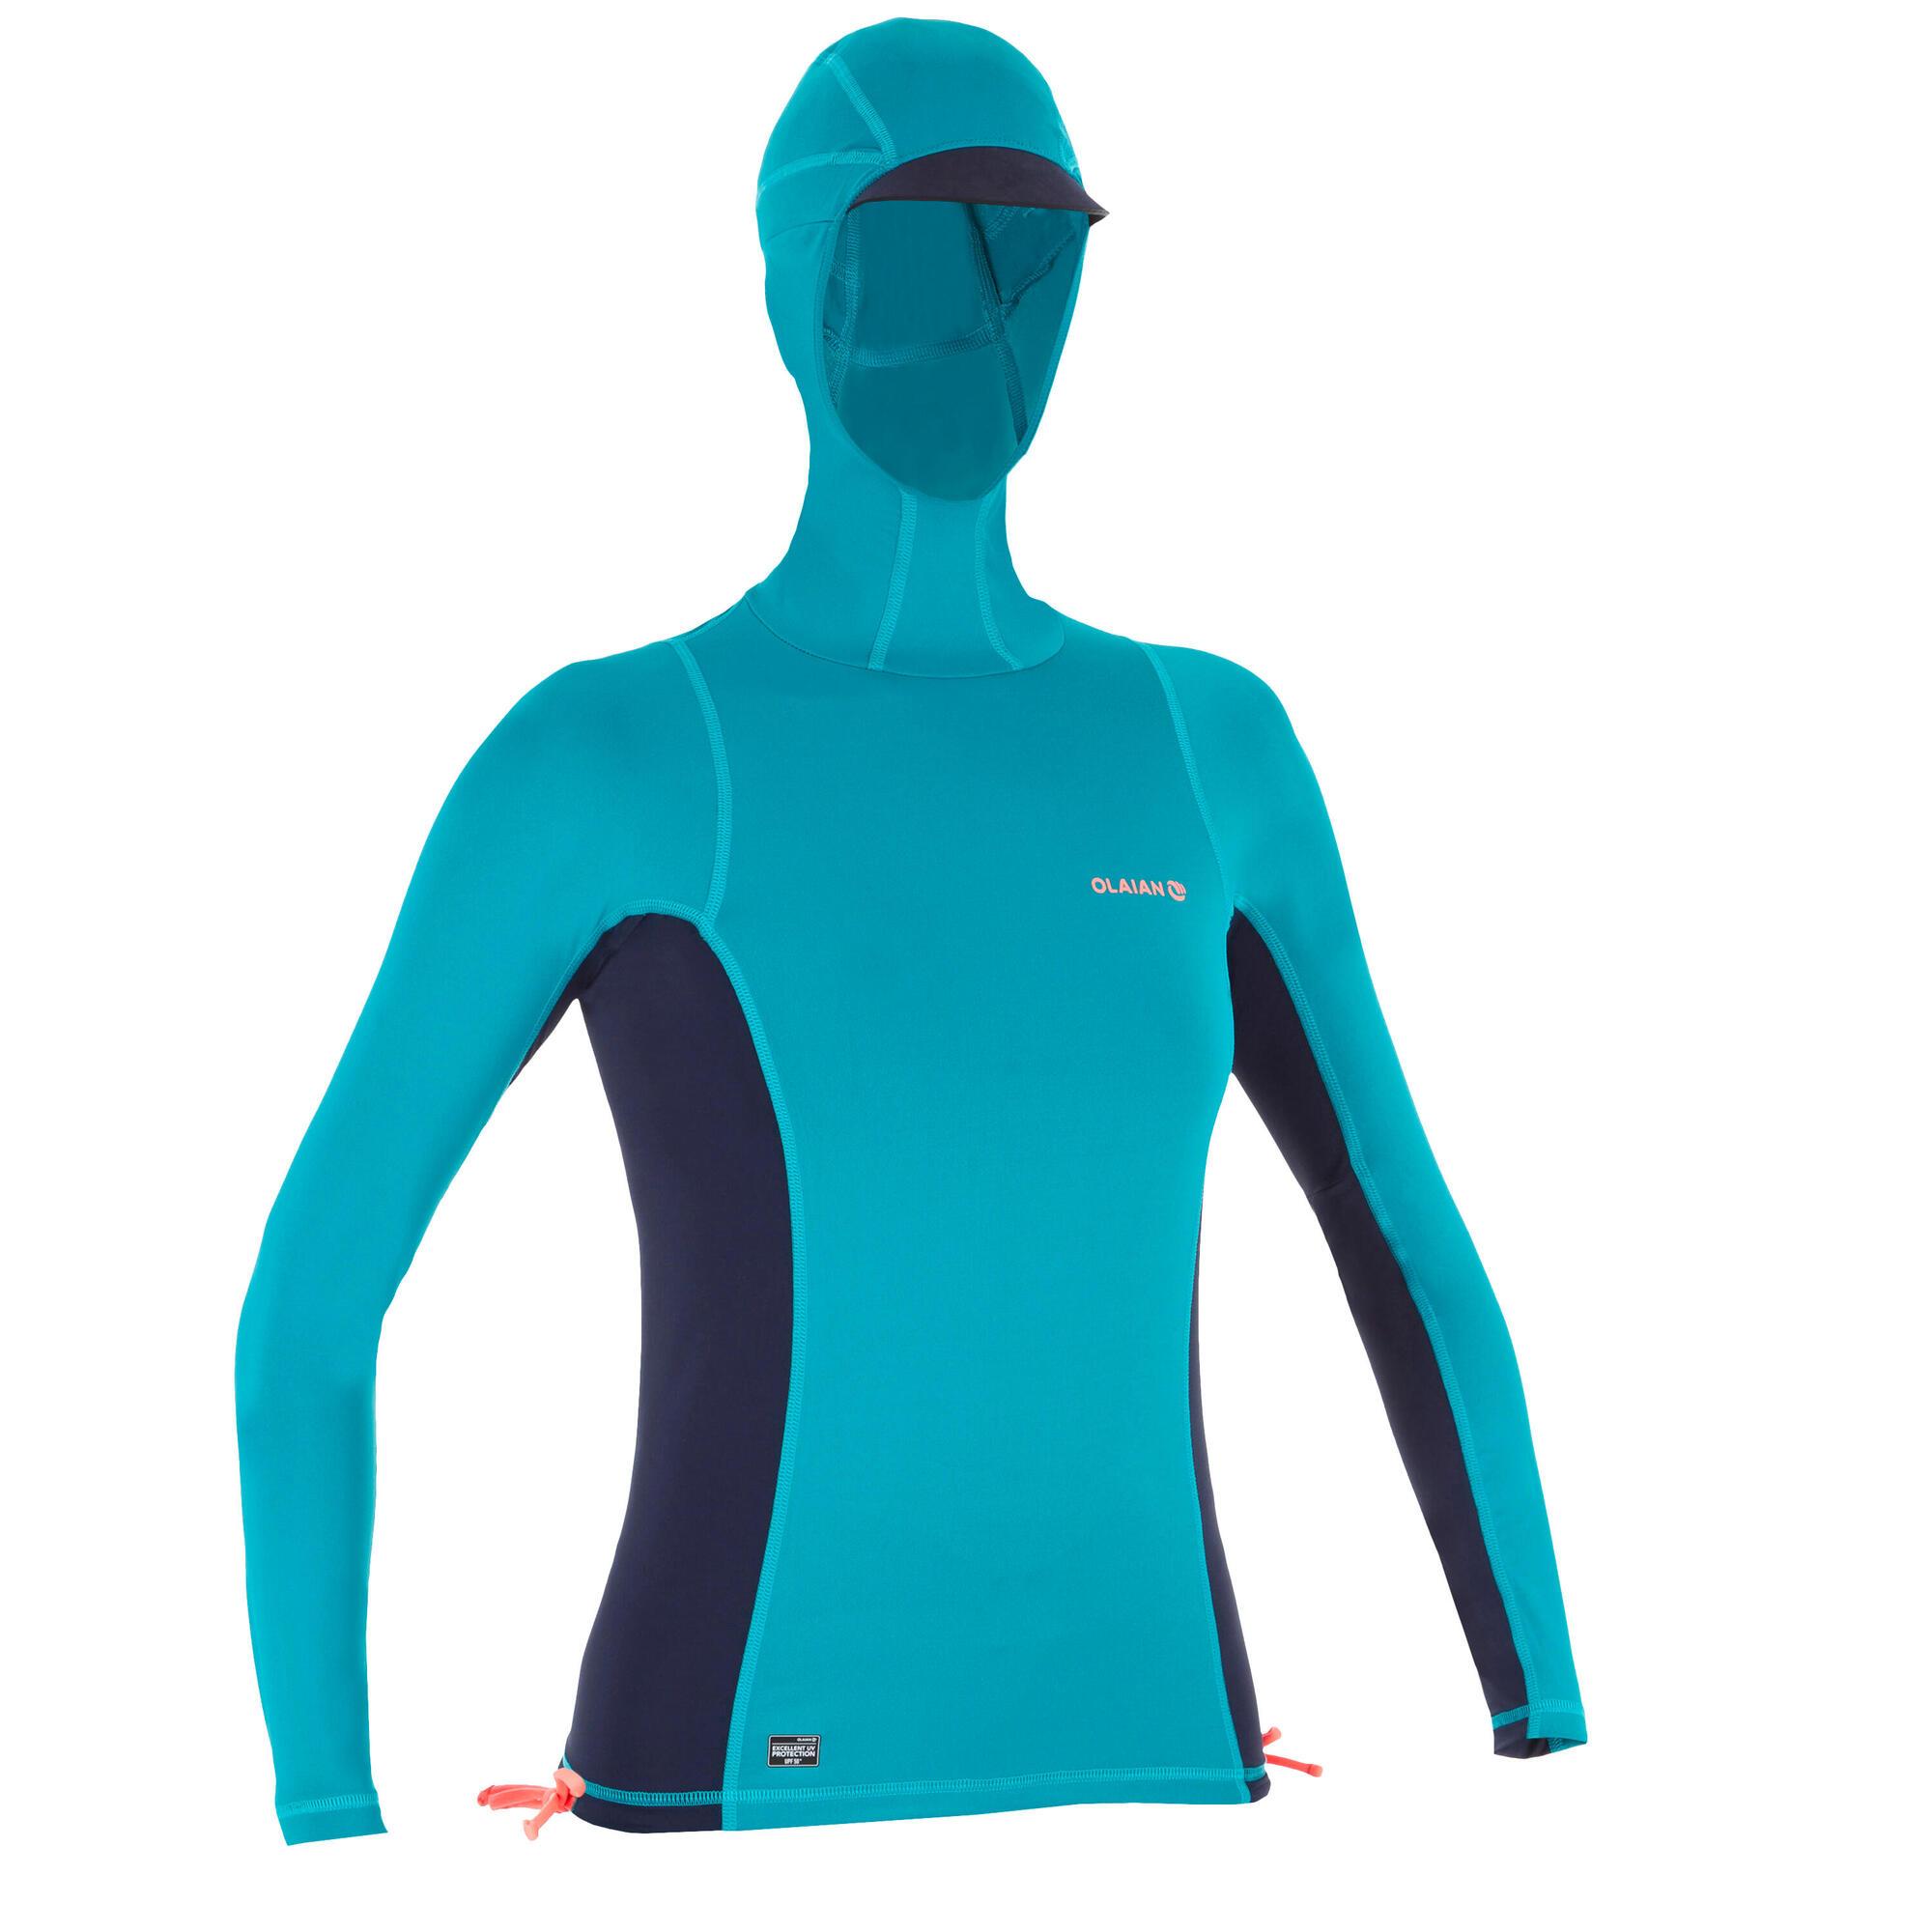 3be1fb0859 tee_shirt_anti_uv_surf_top_500_capuche_femme_bleu_vert_olaian_8403294_1296743.jpg